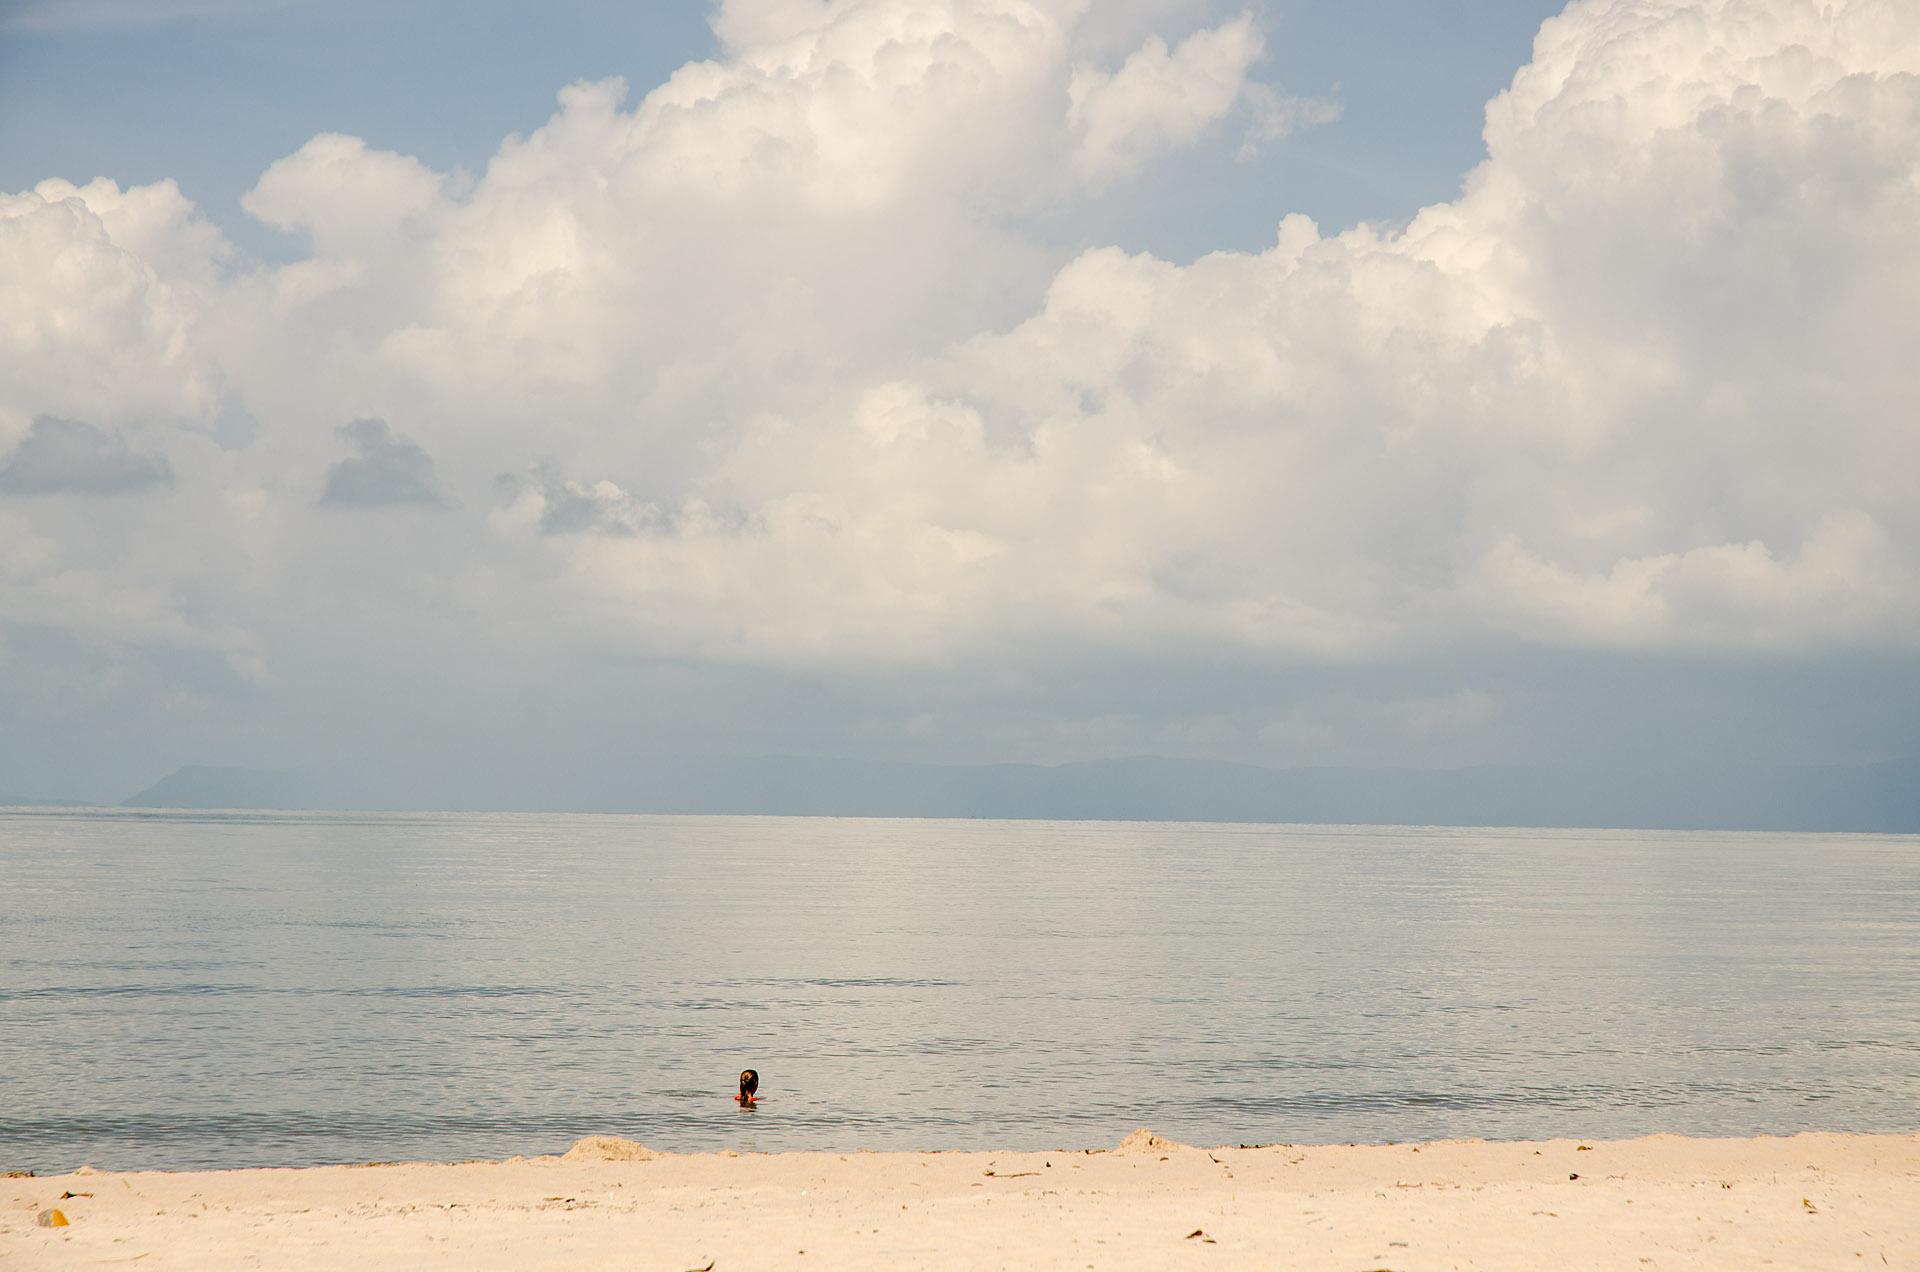 Chhak Kep Bay (Gulf of Thailand) all to myself